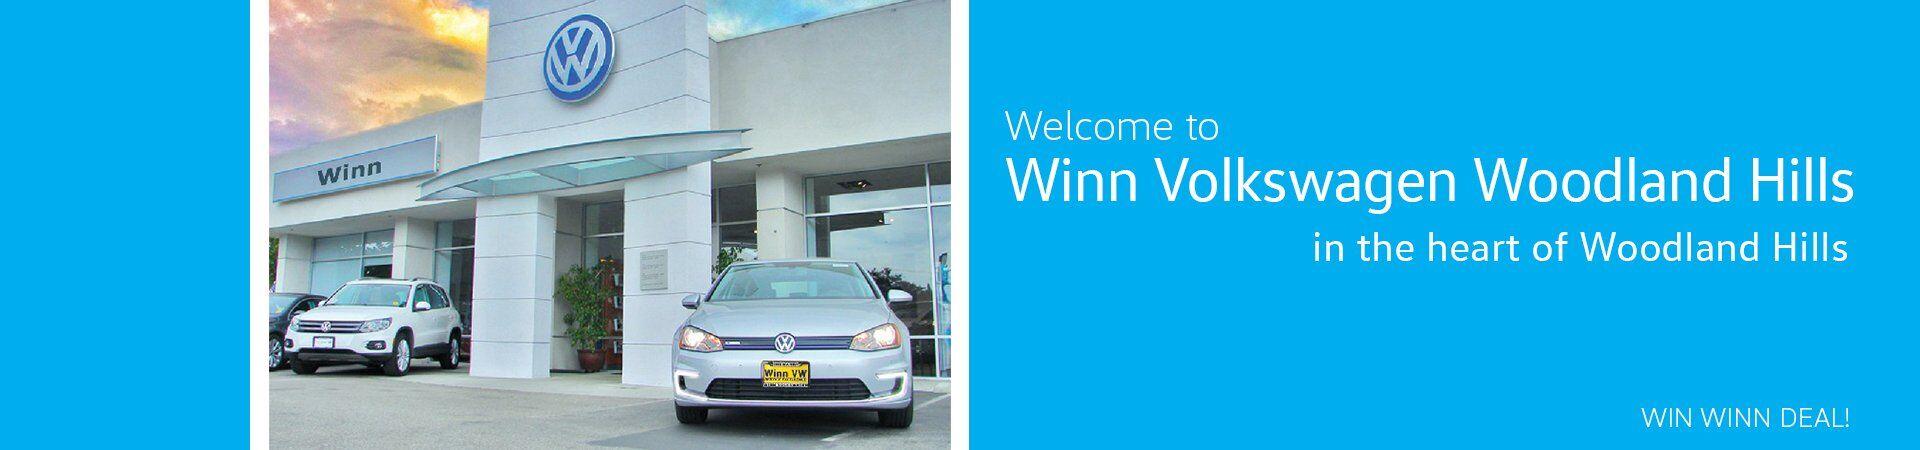 Winn VW   Volkswagen Dealer San Fernando Valley   Los Angeles VW Dealer